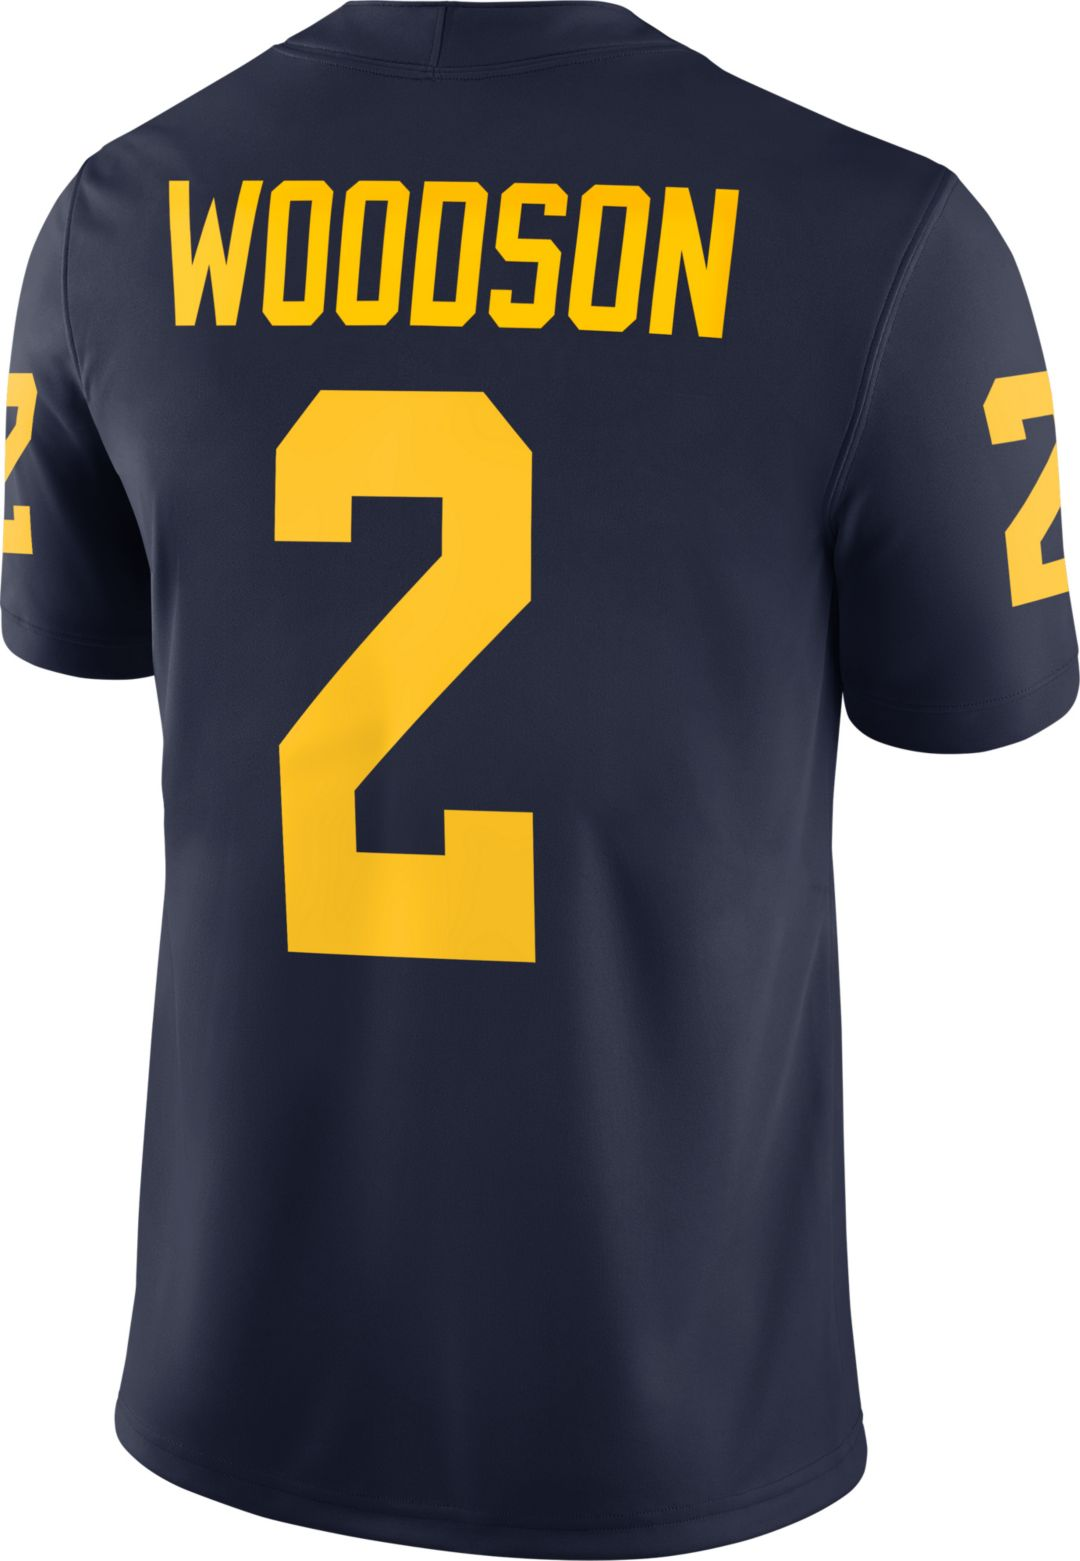 online store cffa0 f9d34 Jordan Men's Charles Woodson Michigan Wolverines #2 Blue Dri-FIT Game  Football Jersey